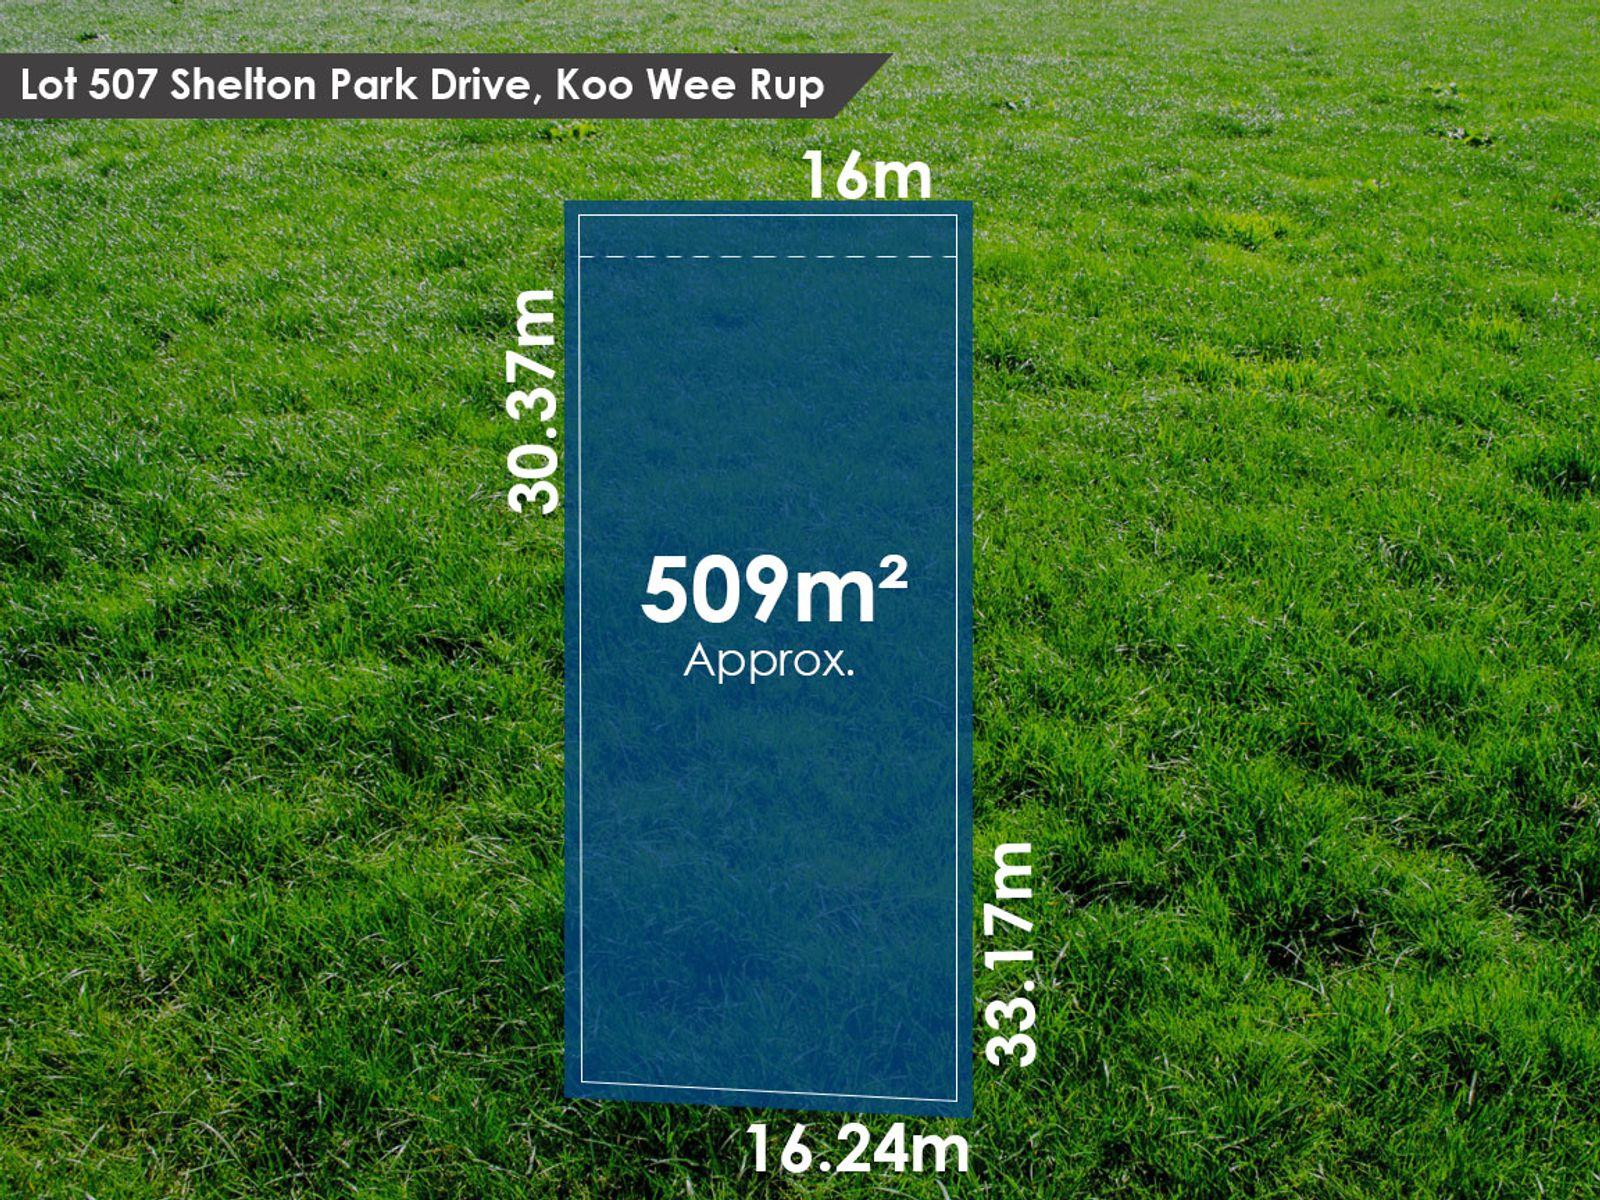 Lot 507 Shelton Park Drive, Koo Wee Rup, VIC 3981